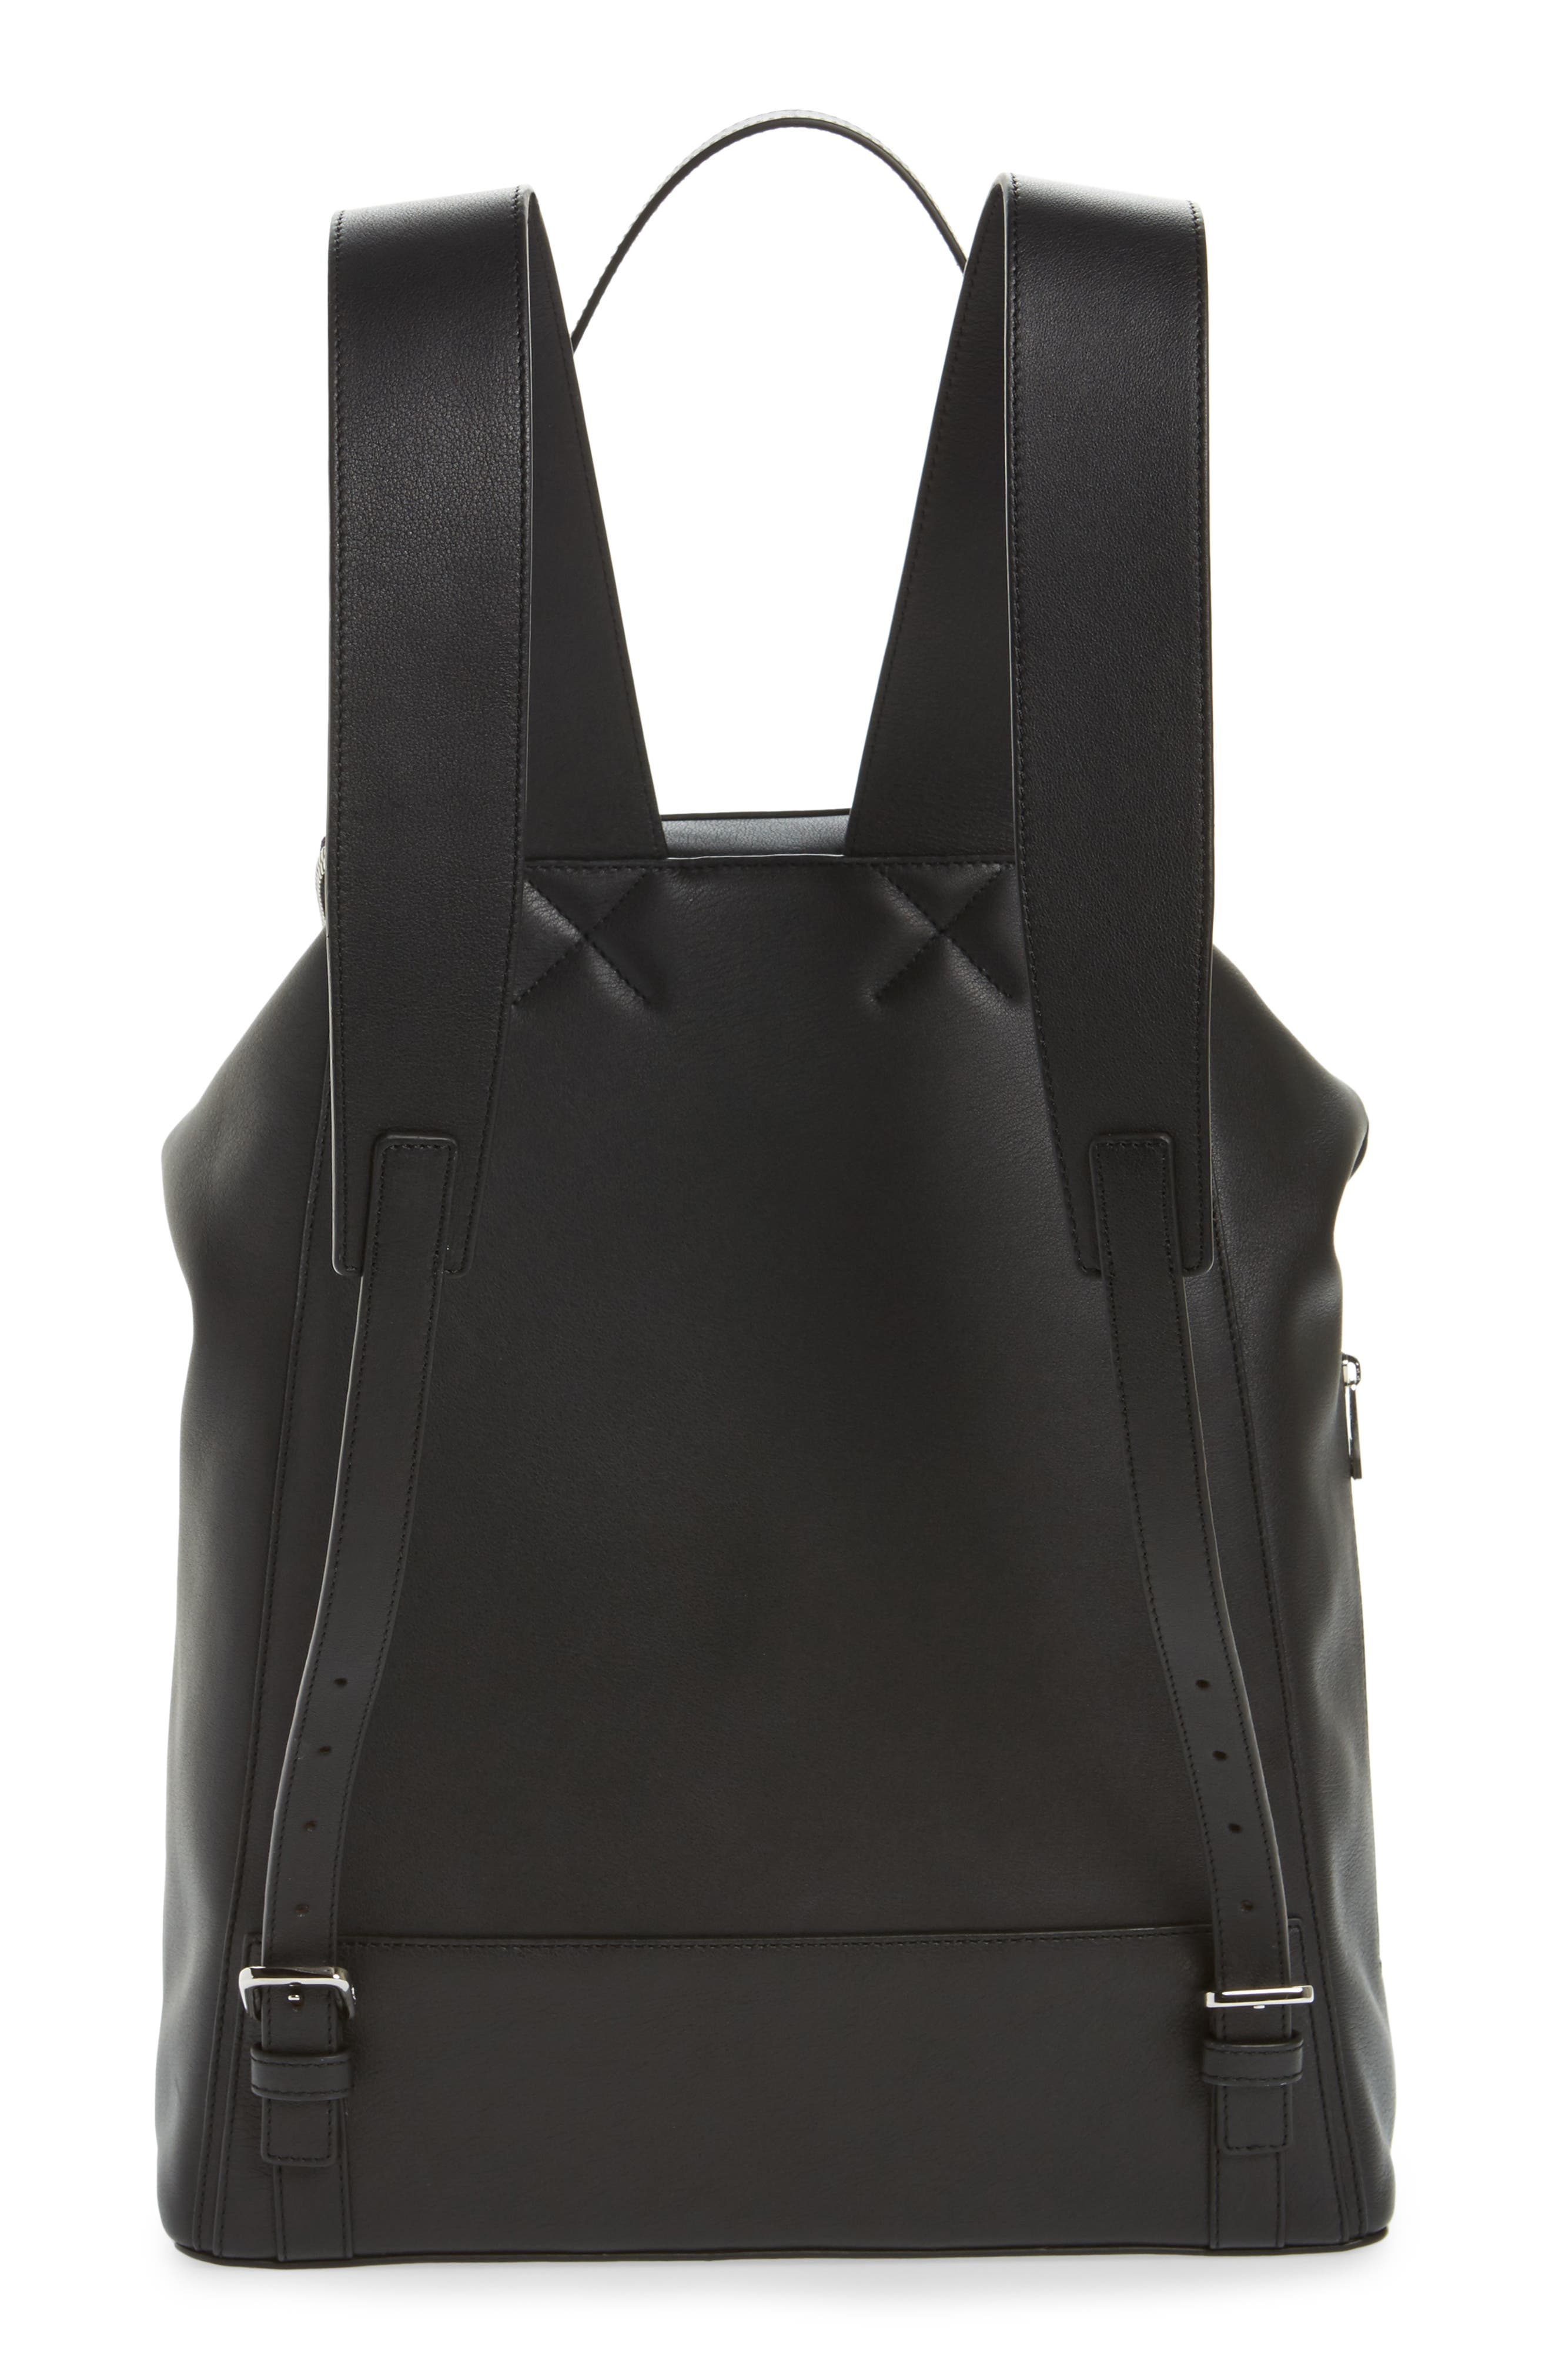 LOEWE, Goya Leather Backpack, Alternate thumbnail 3, color, BLACK